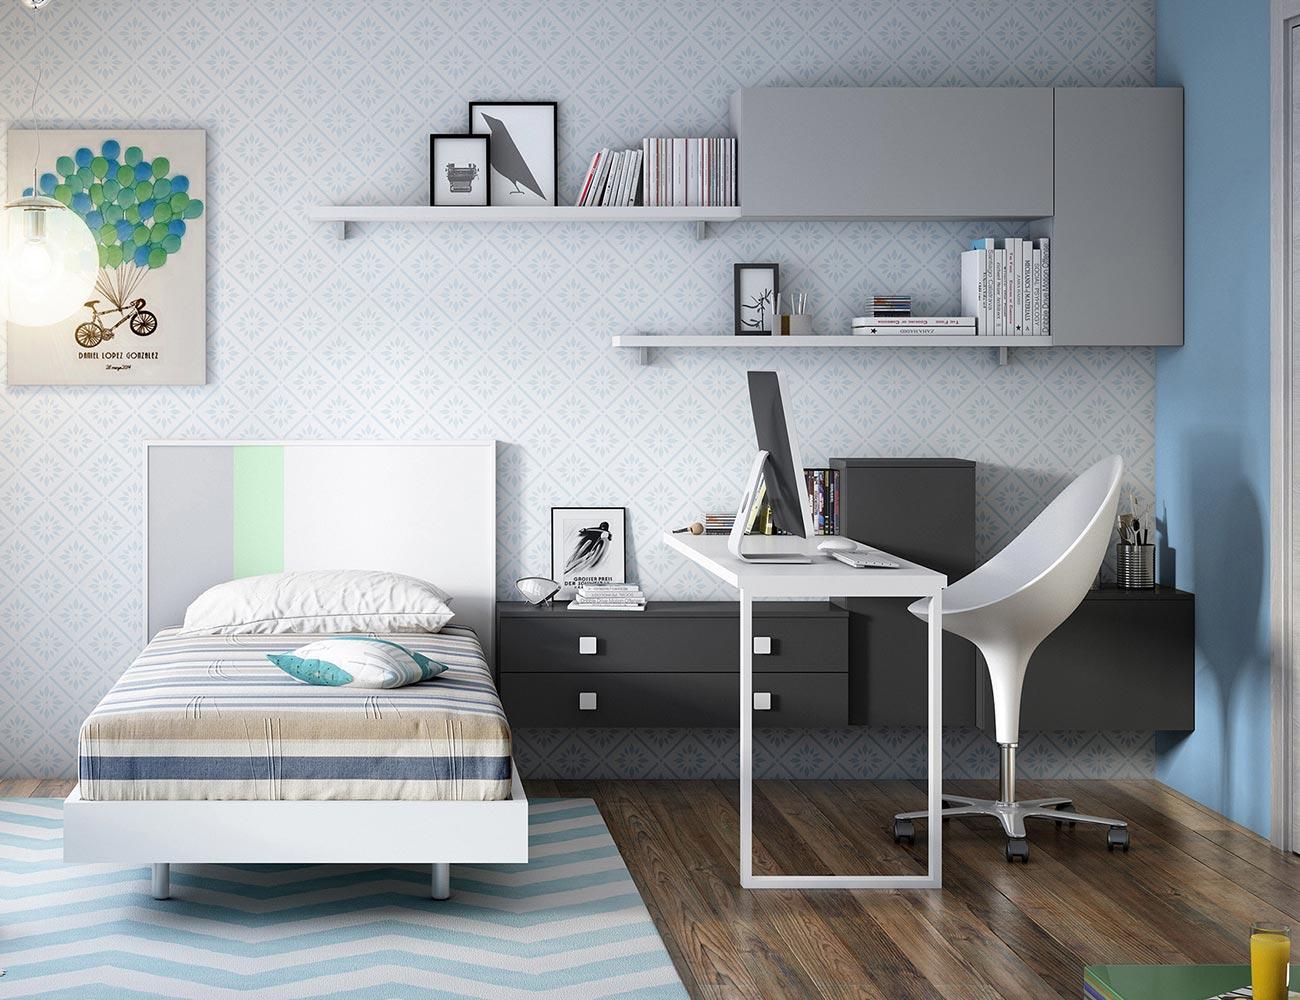 Dormitorio juvenil moderno cama tatami